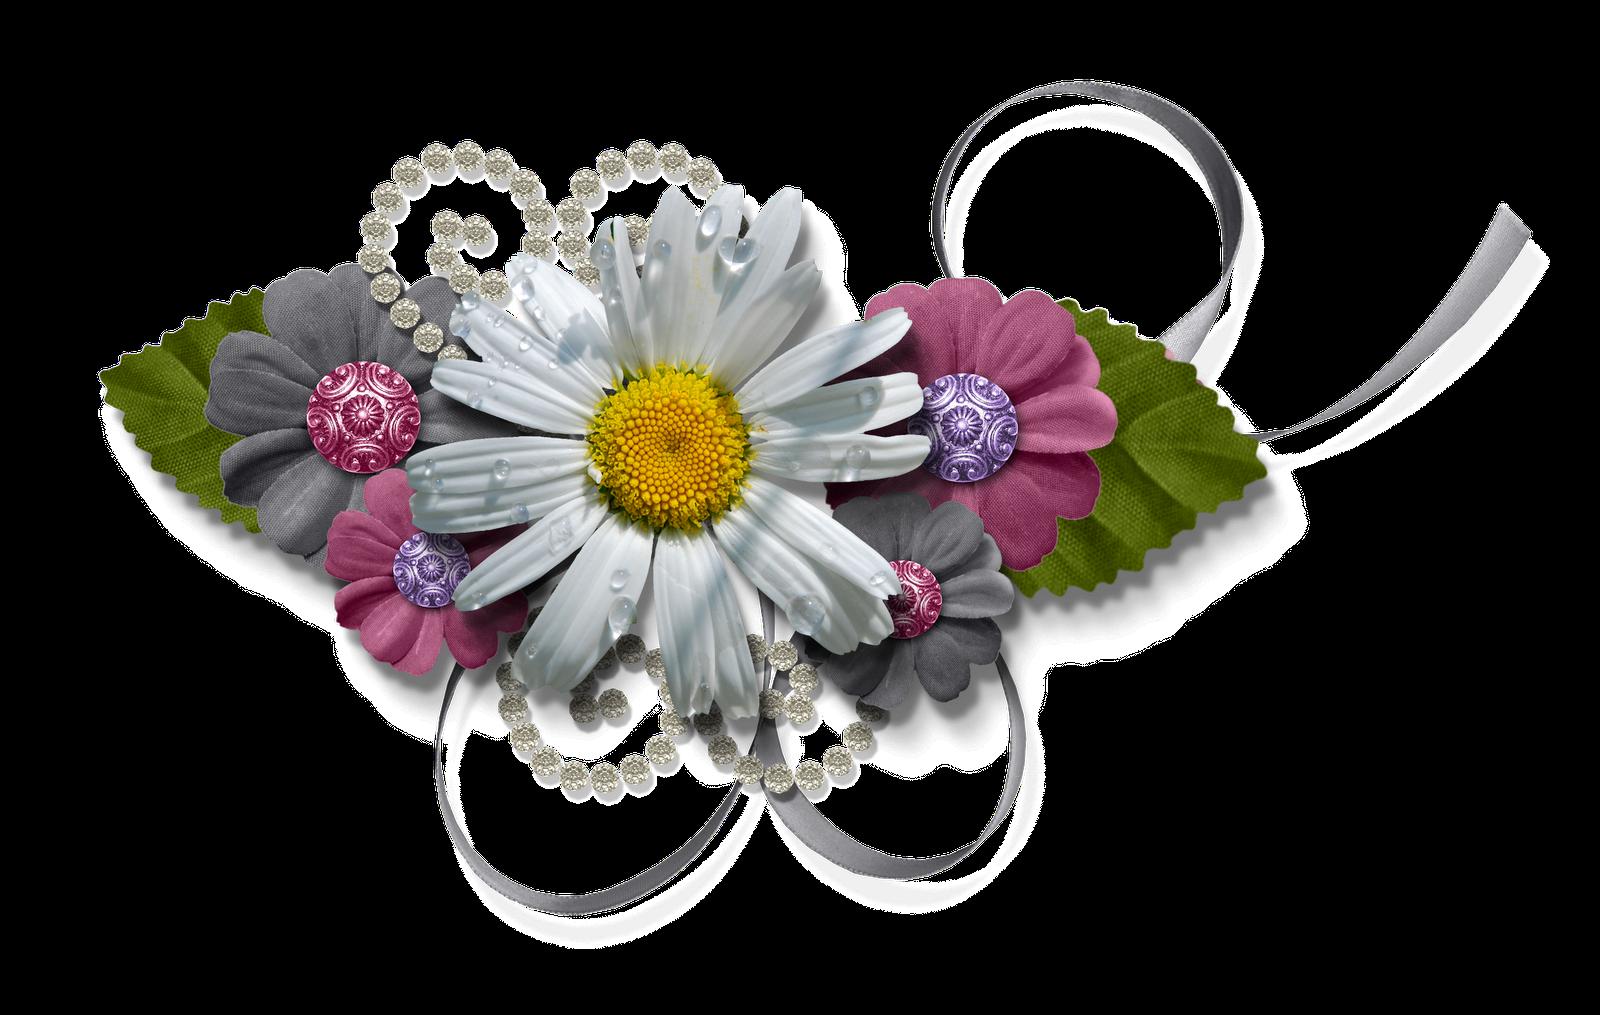 Scrapbook png cluster freebies. Mayflower clipart gerbera flower